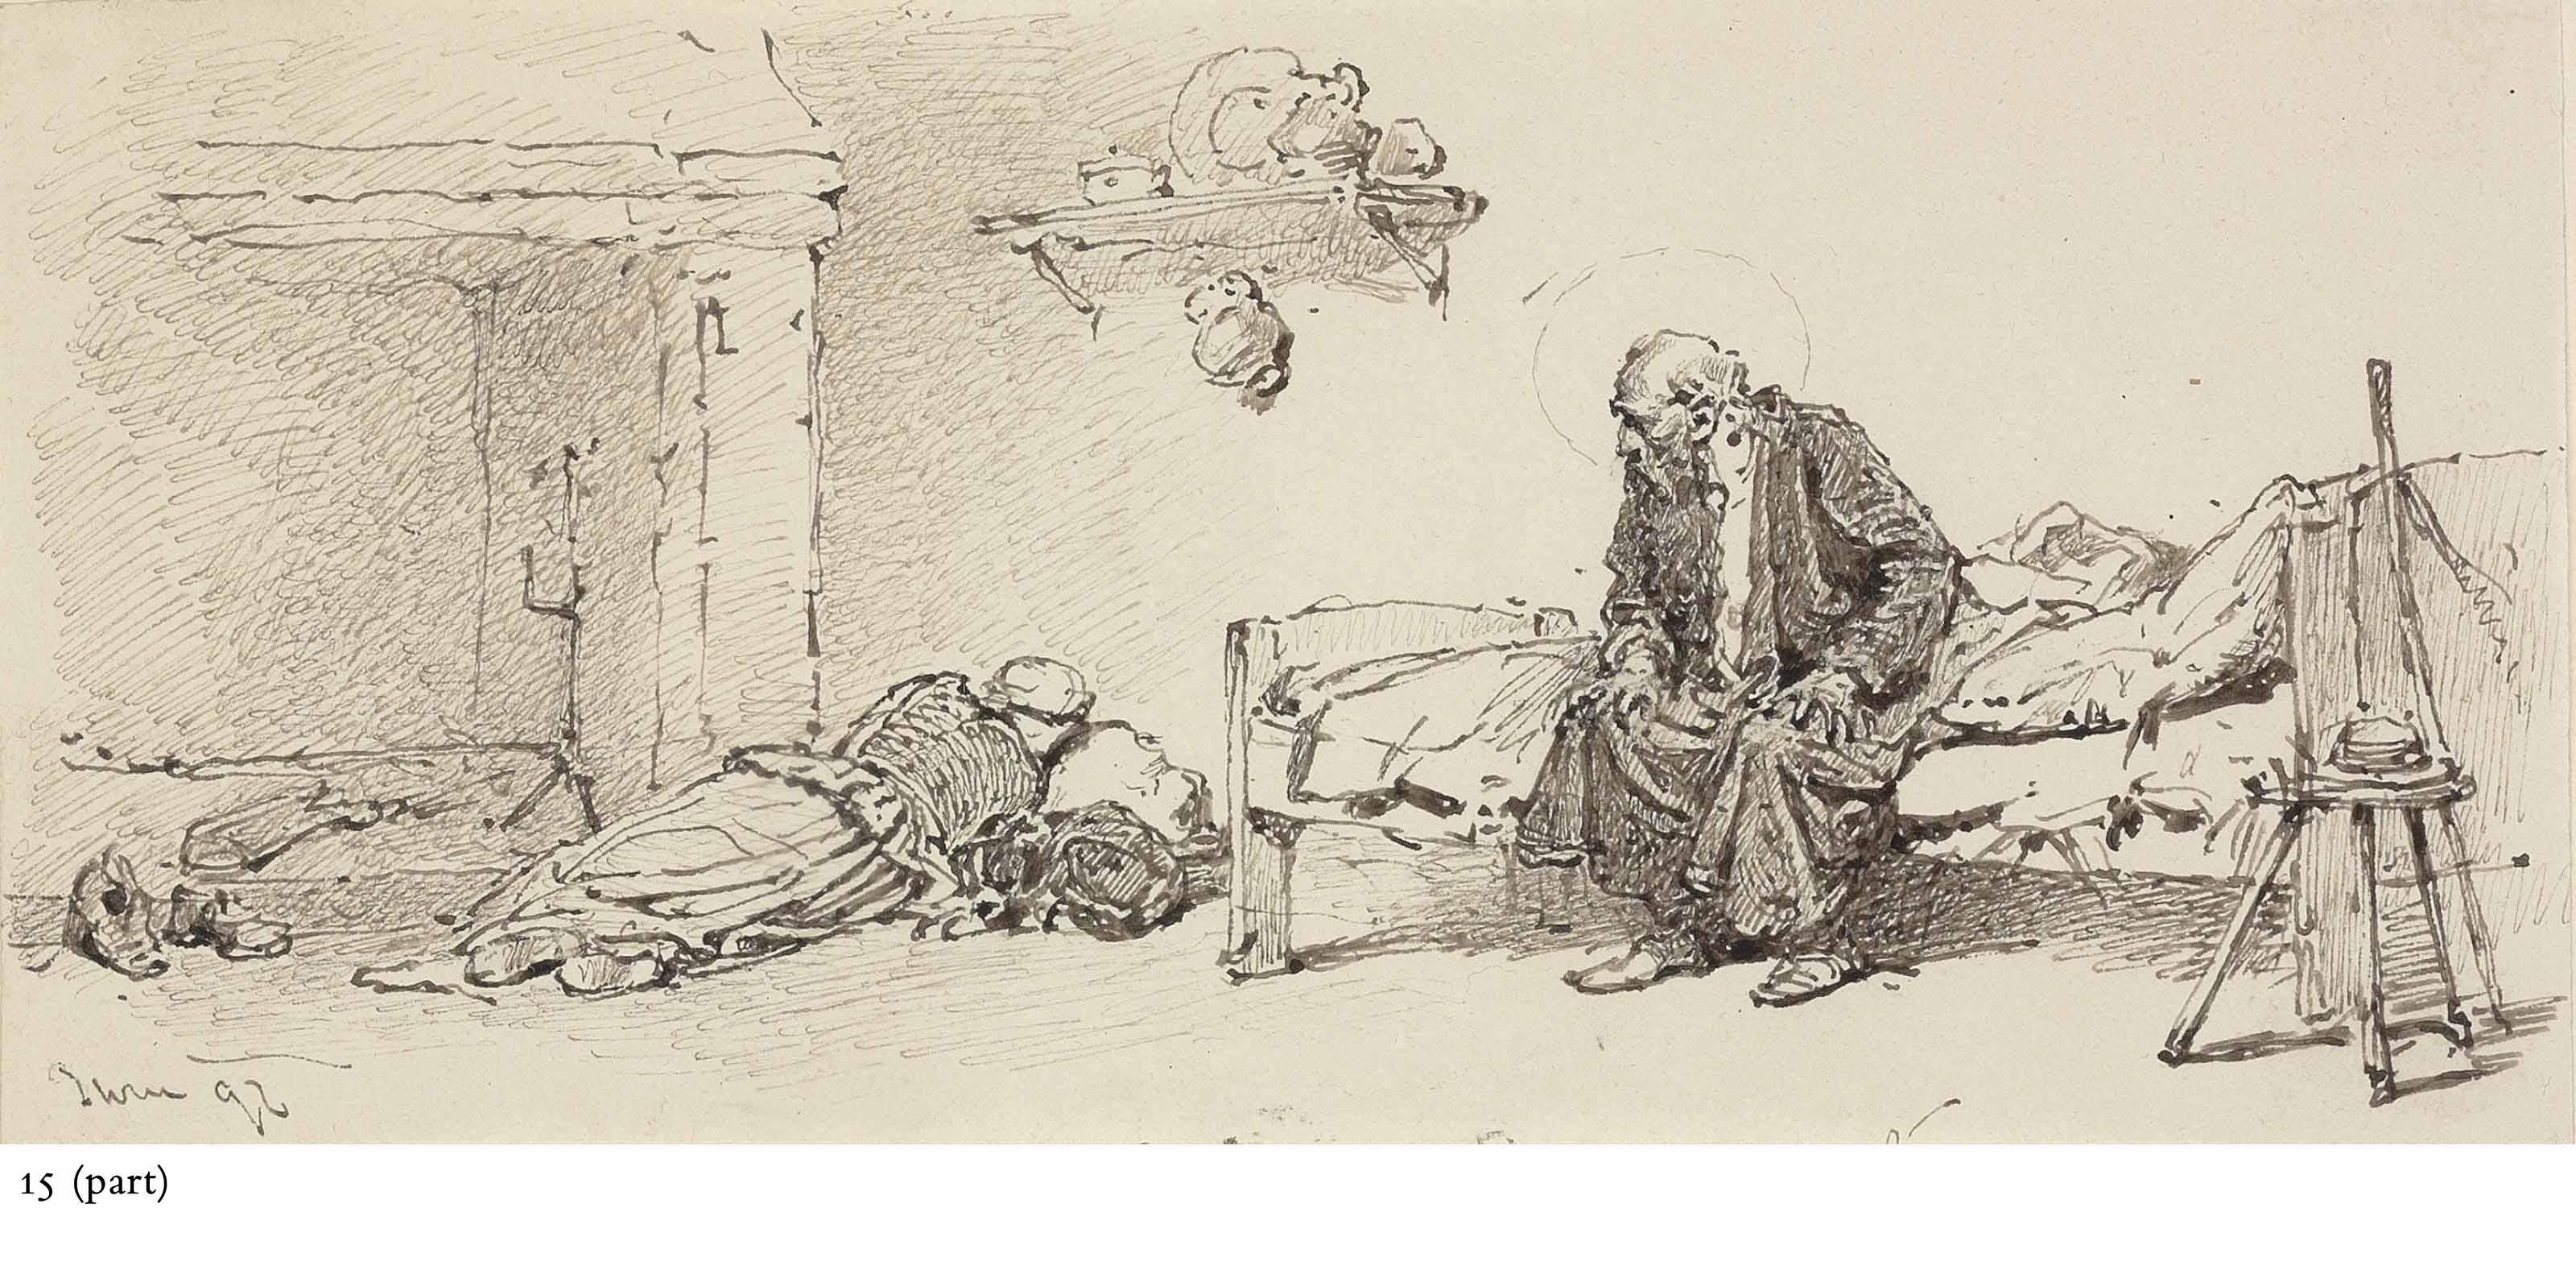 MIKHAIL ZICHY (1827-1906)